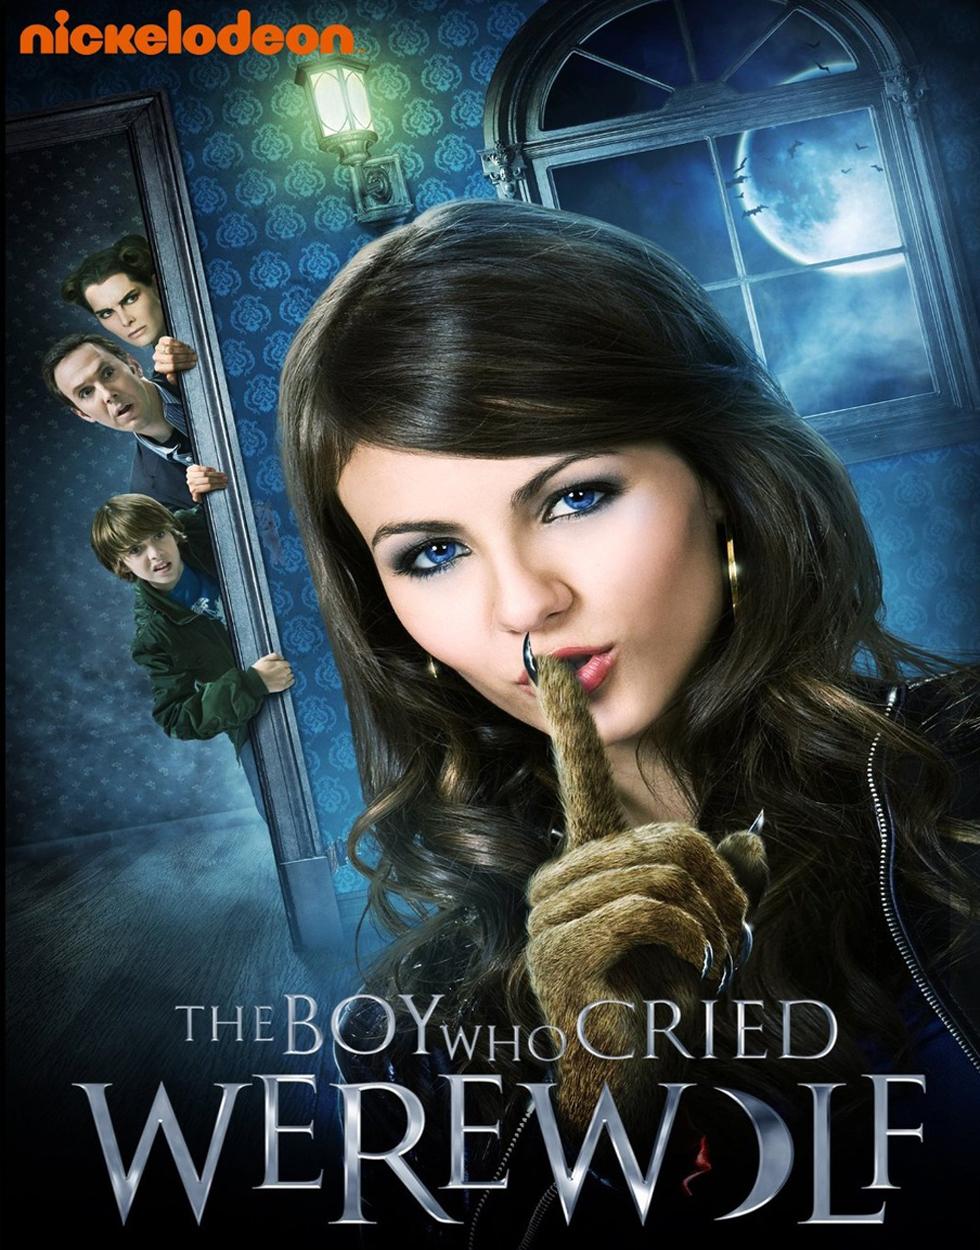 Boy Who Cried Werewolf.jpg